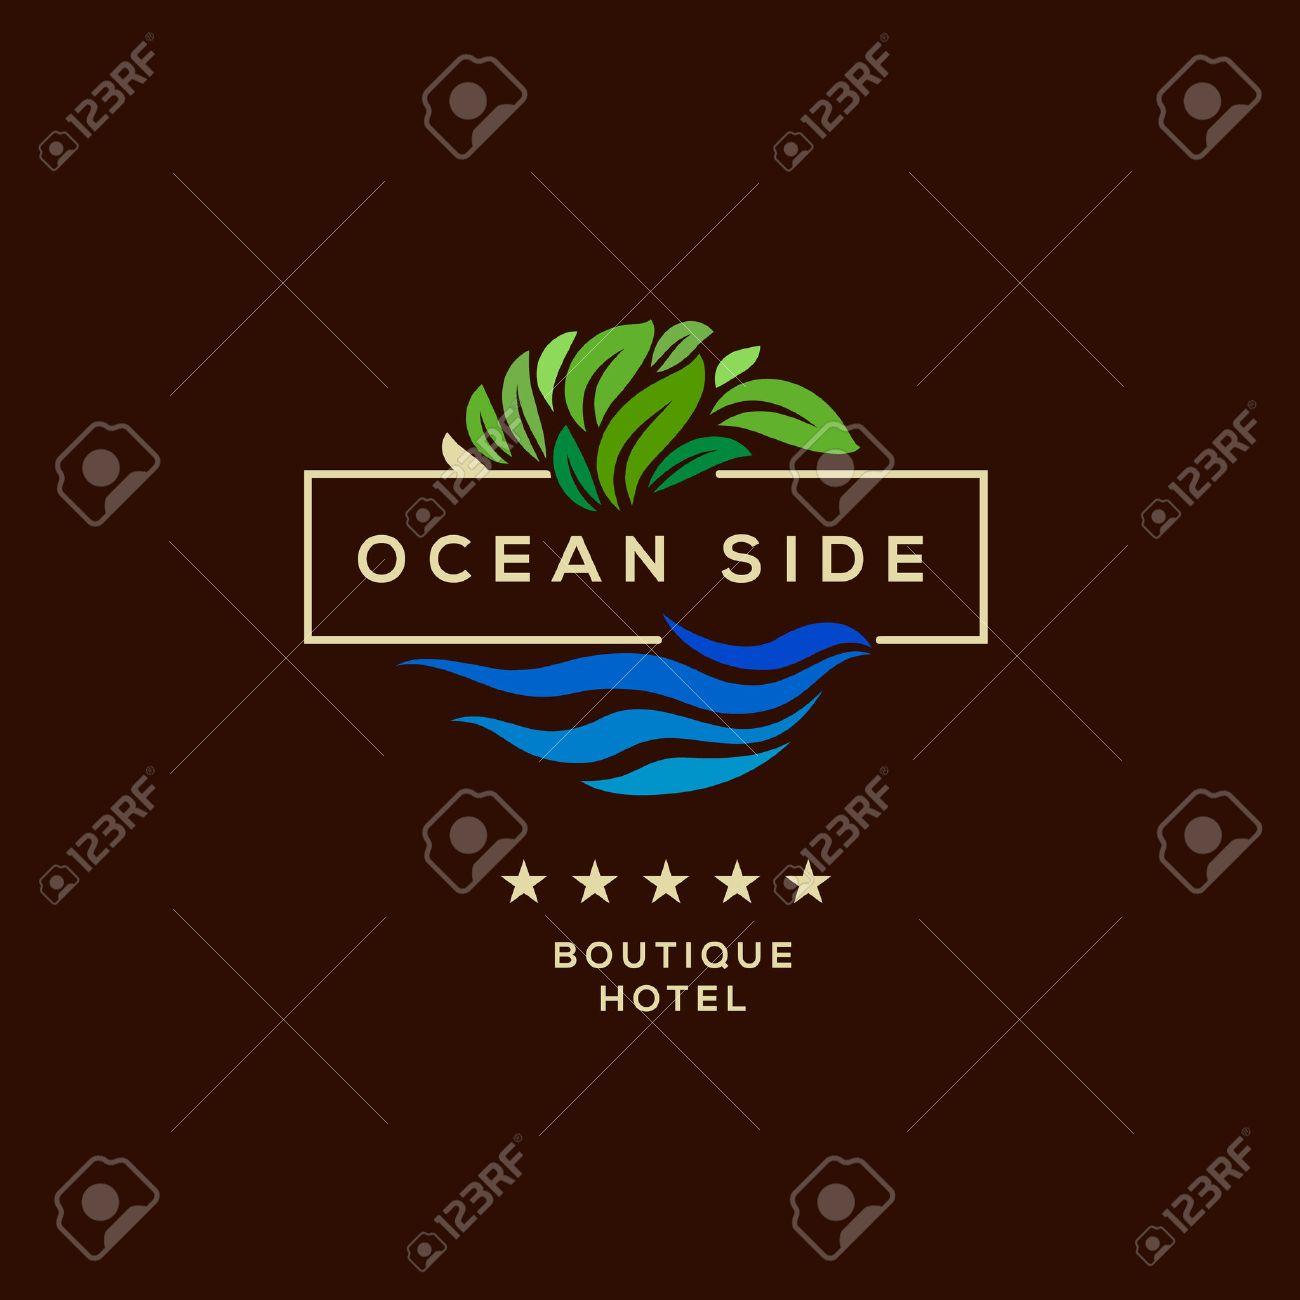 Logo for boutique hotel, ocean view resort, logo design, vector illustration. Standard-Bild - 48013764